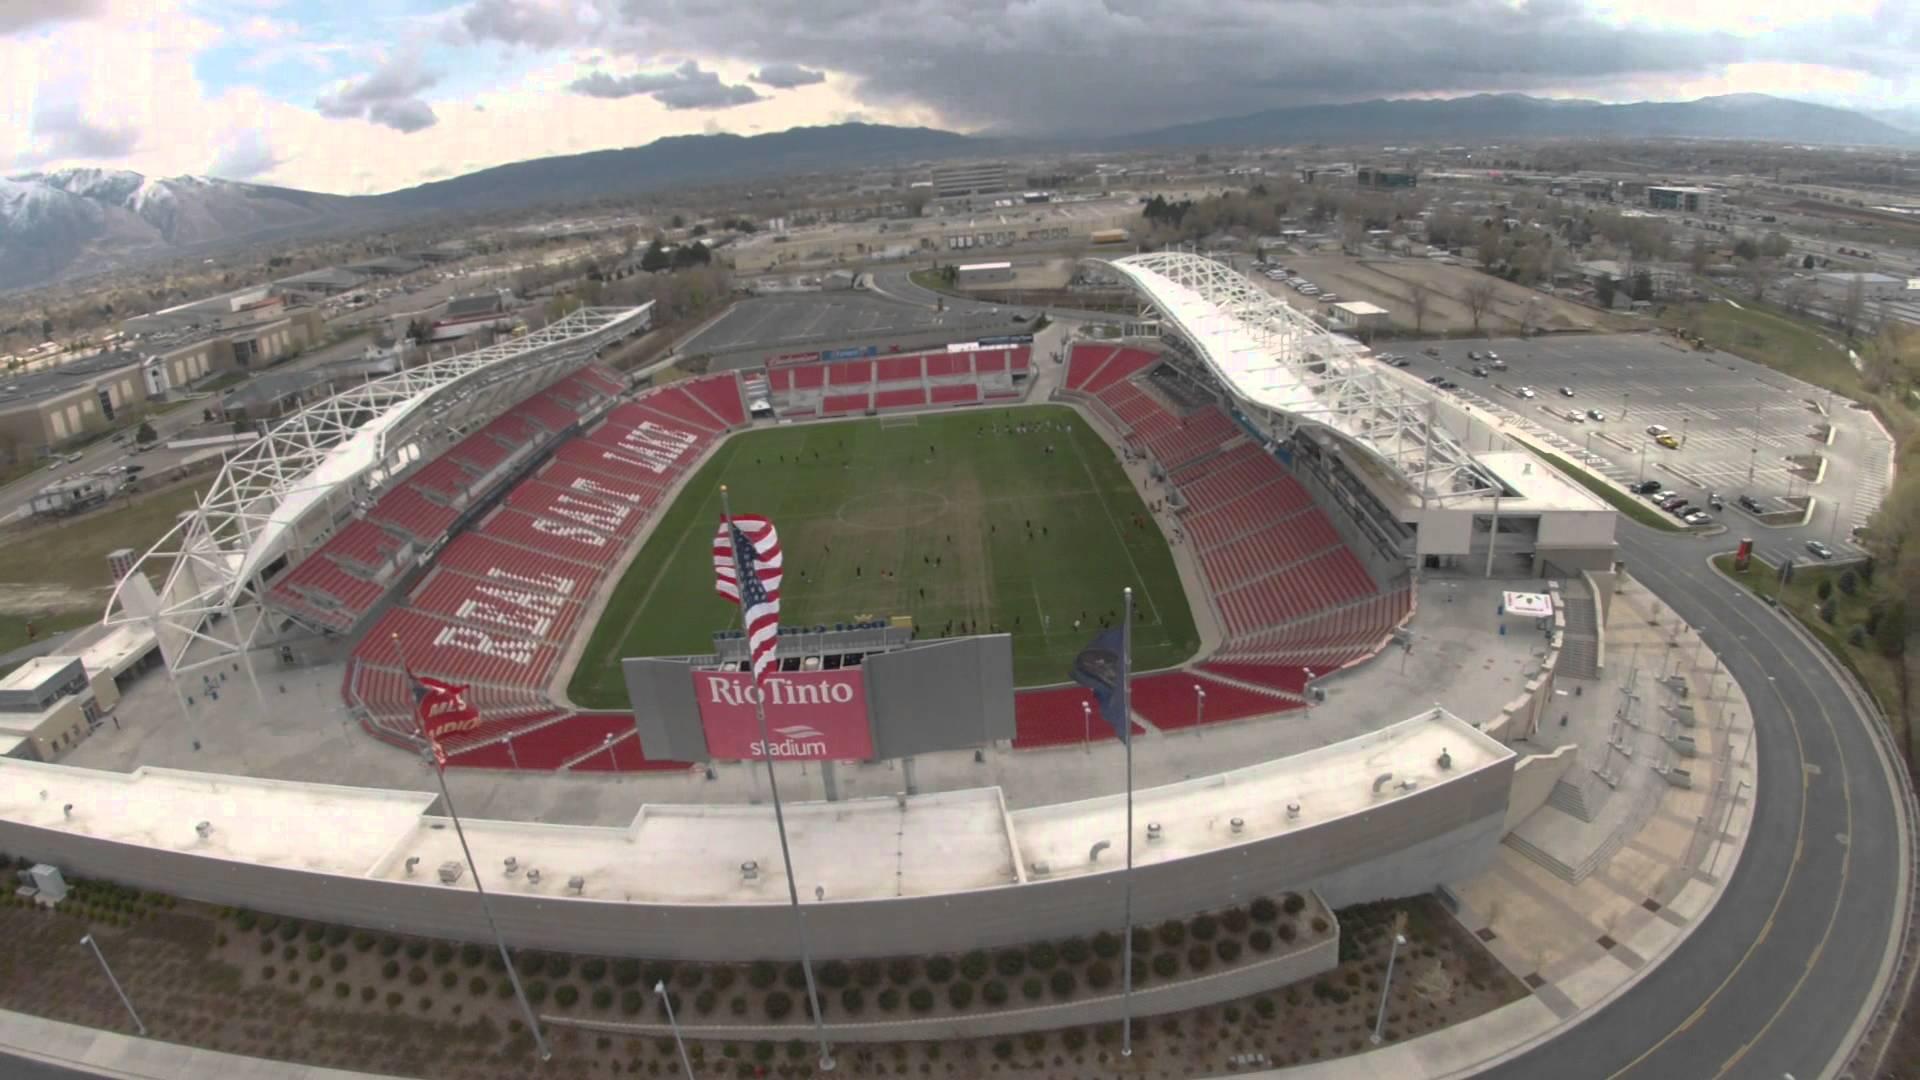 RSL RioTinto Stadium